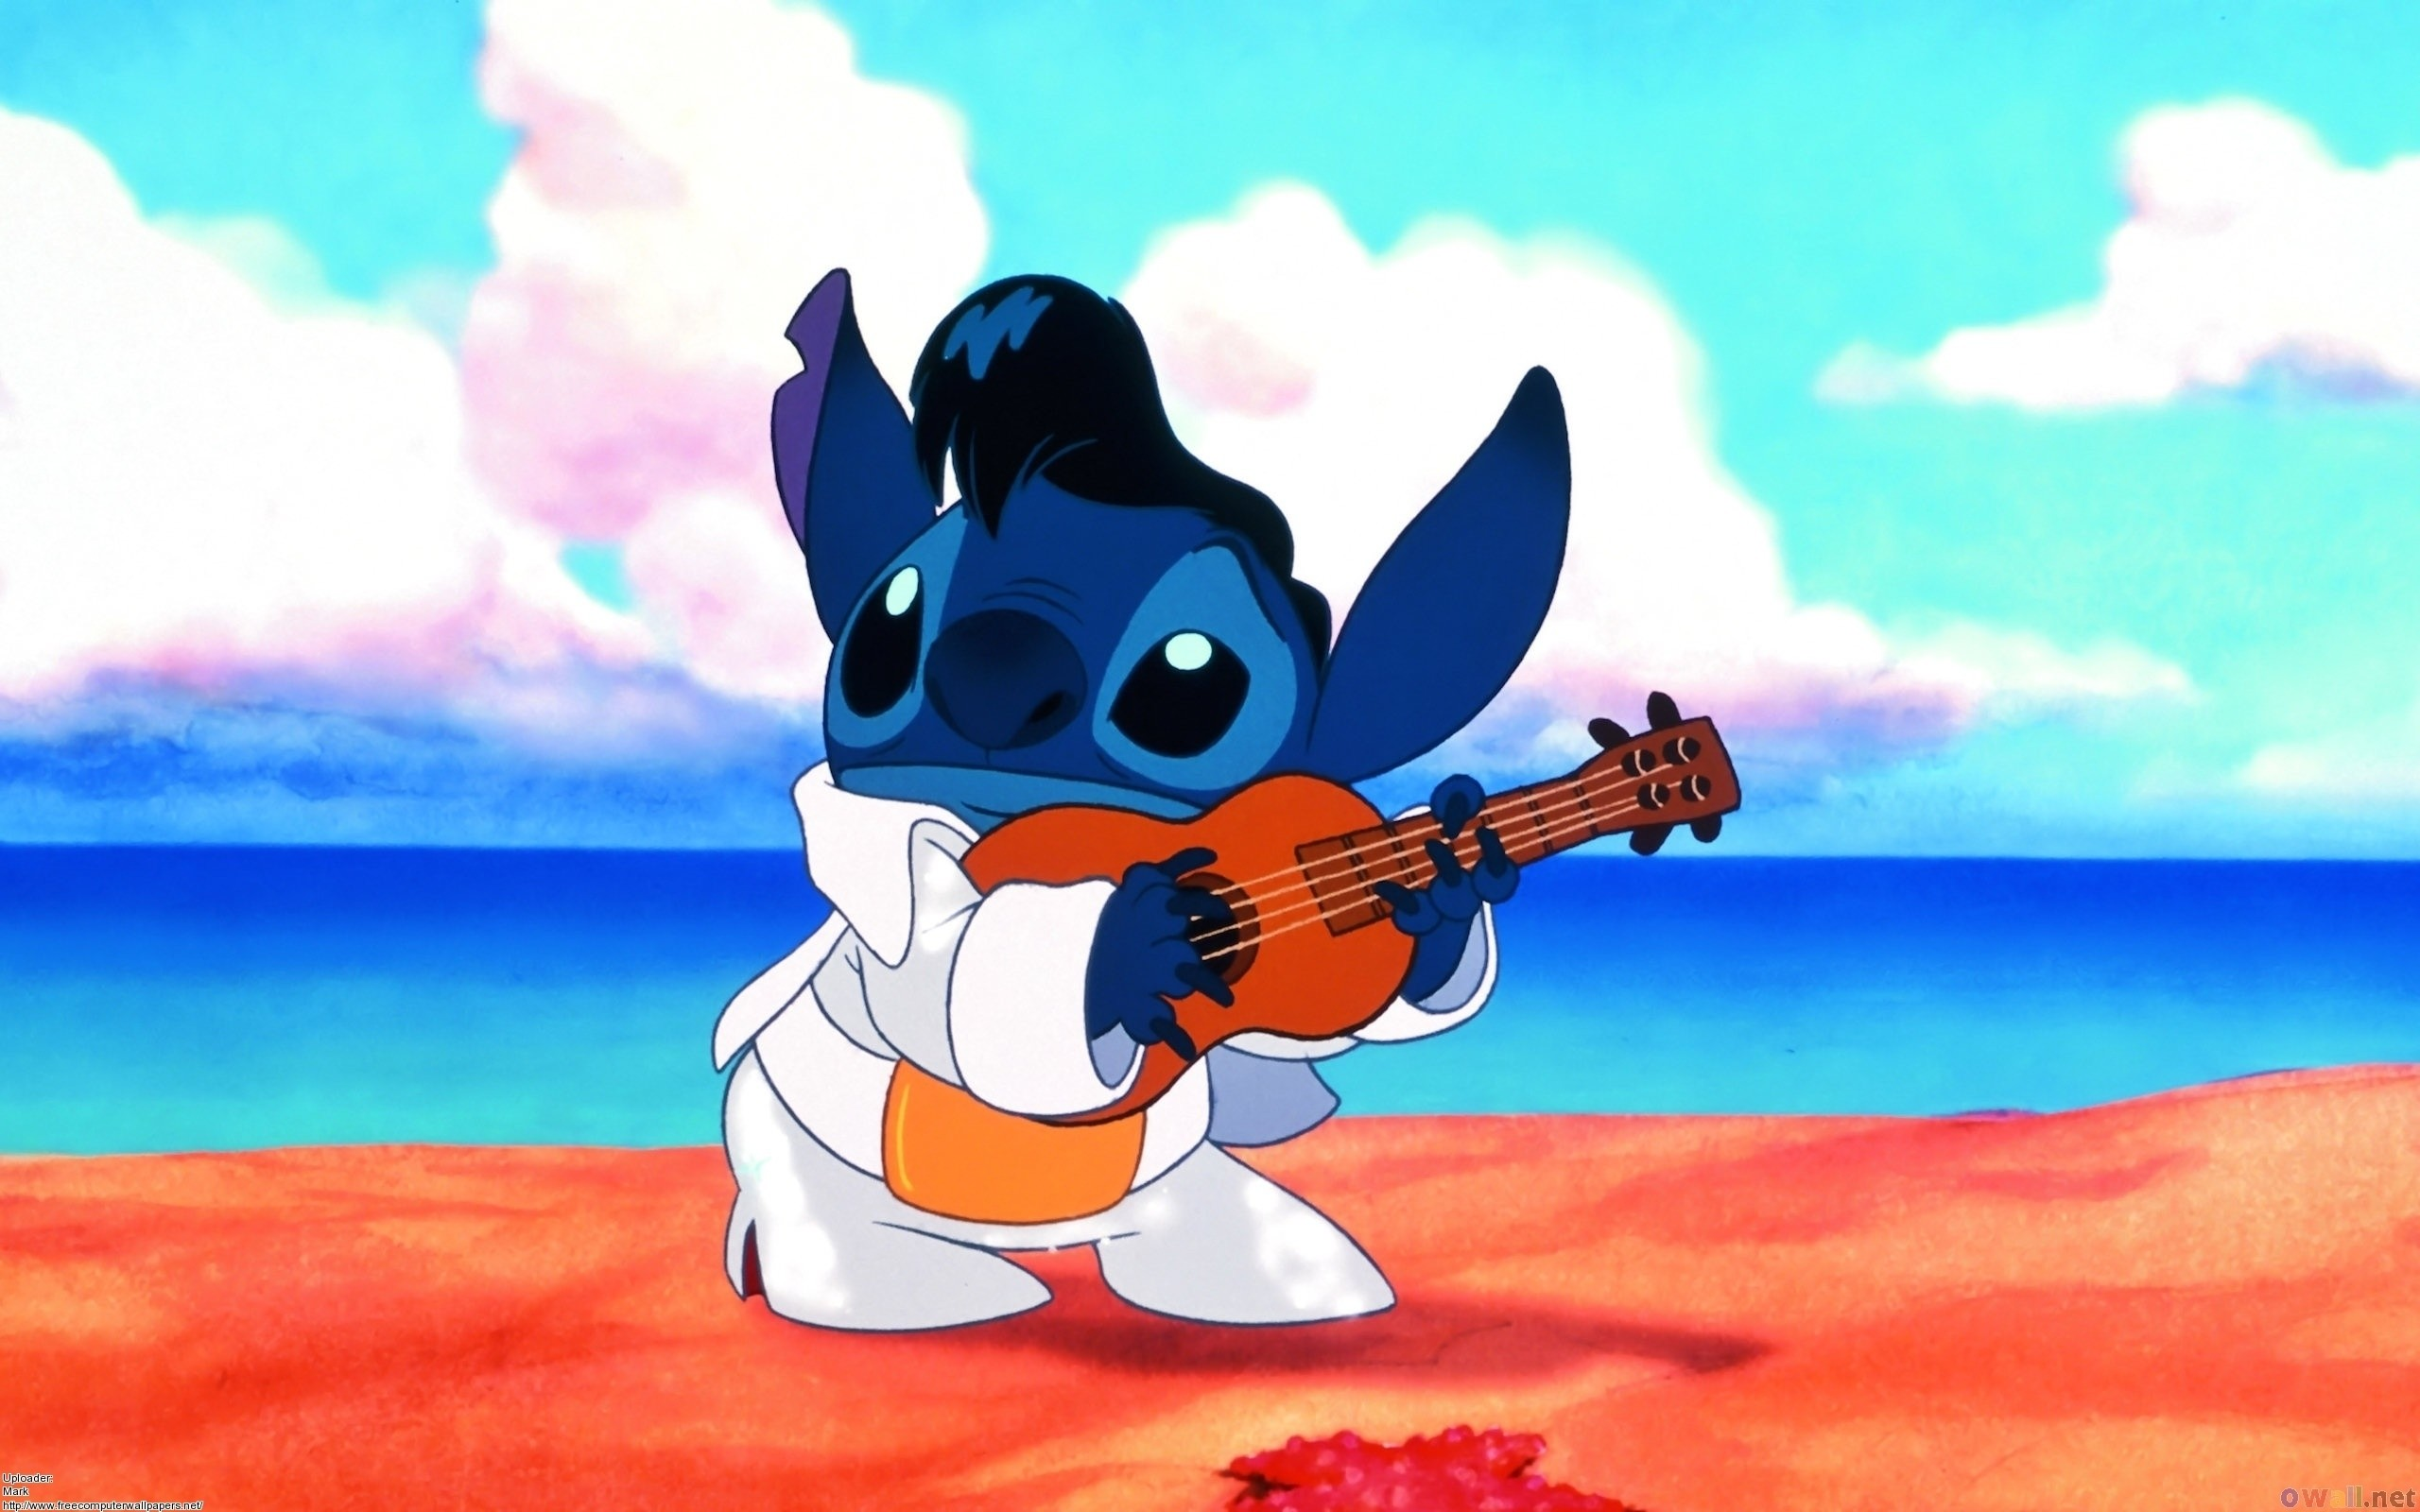 Disney Lilo & Stitch Guitar Cartoons wallpaper background